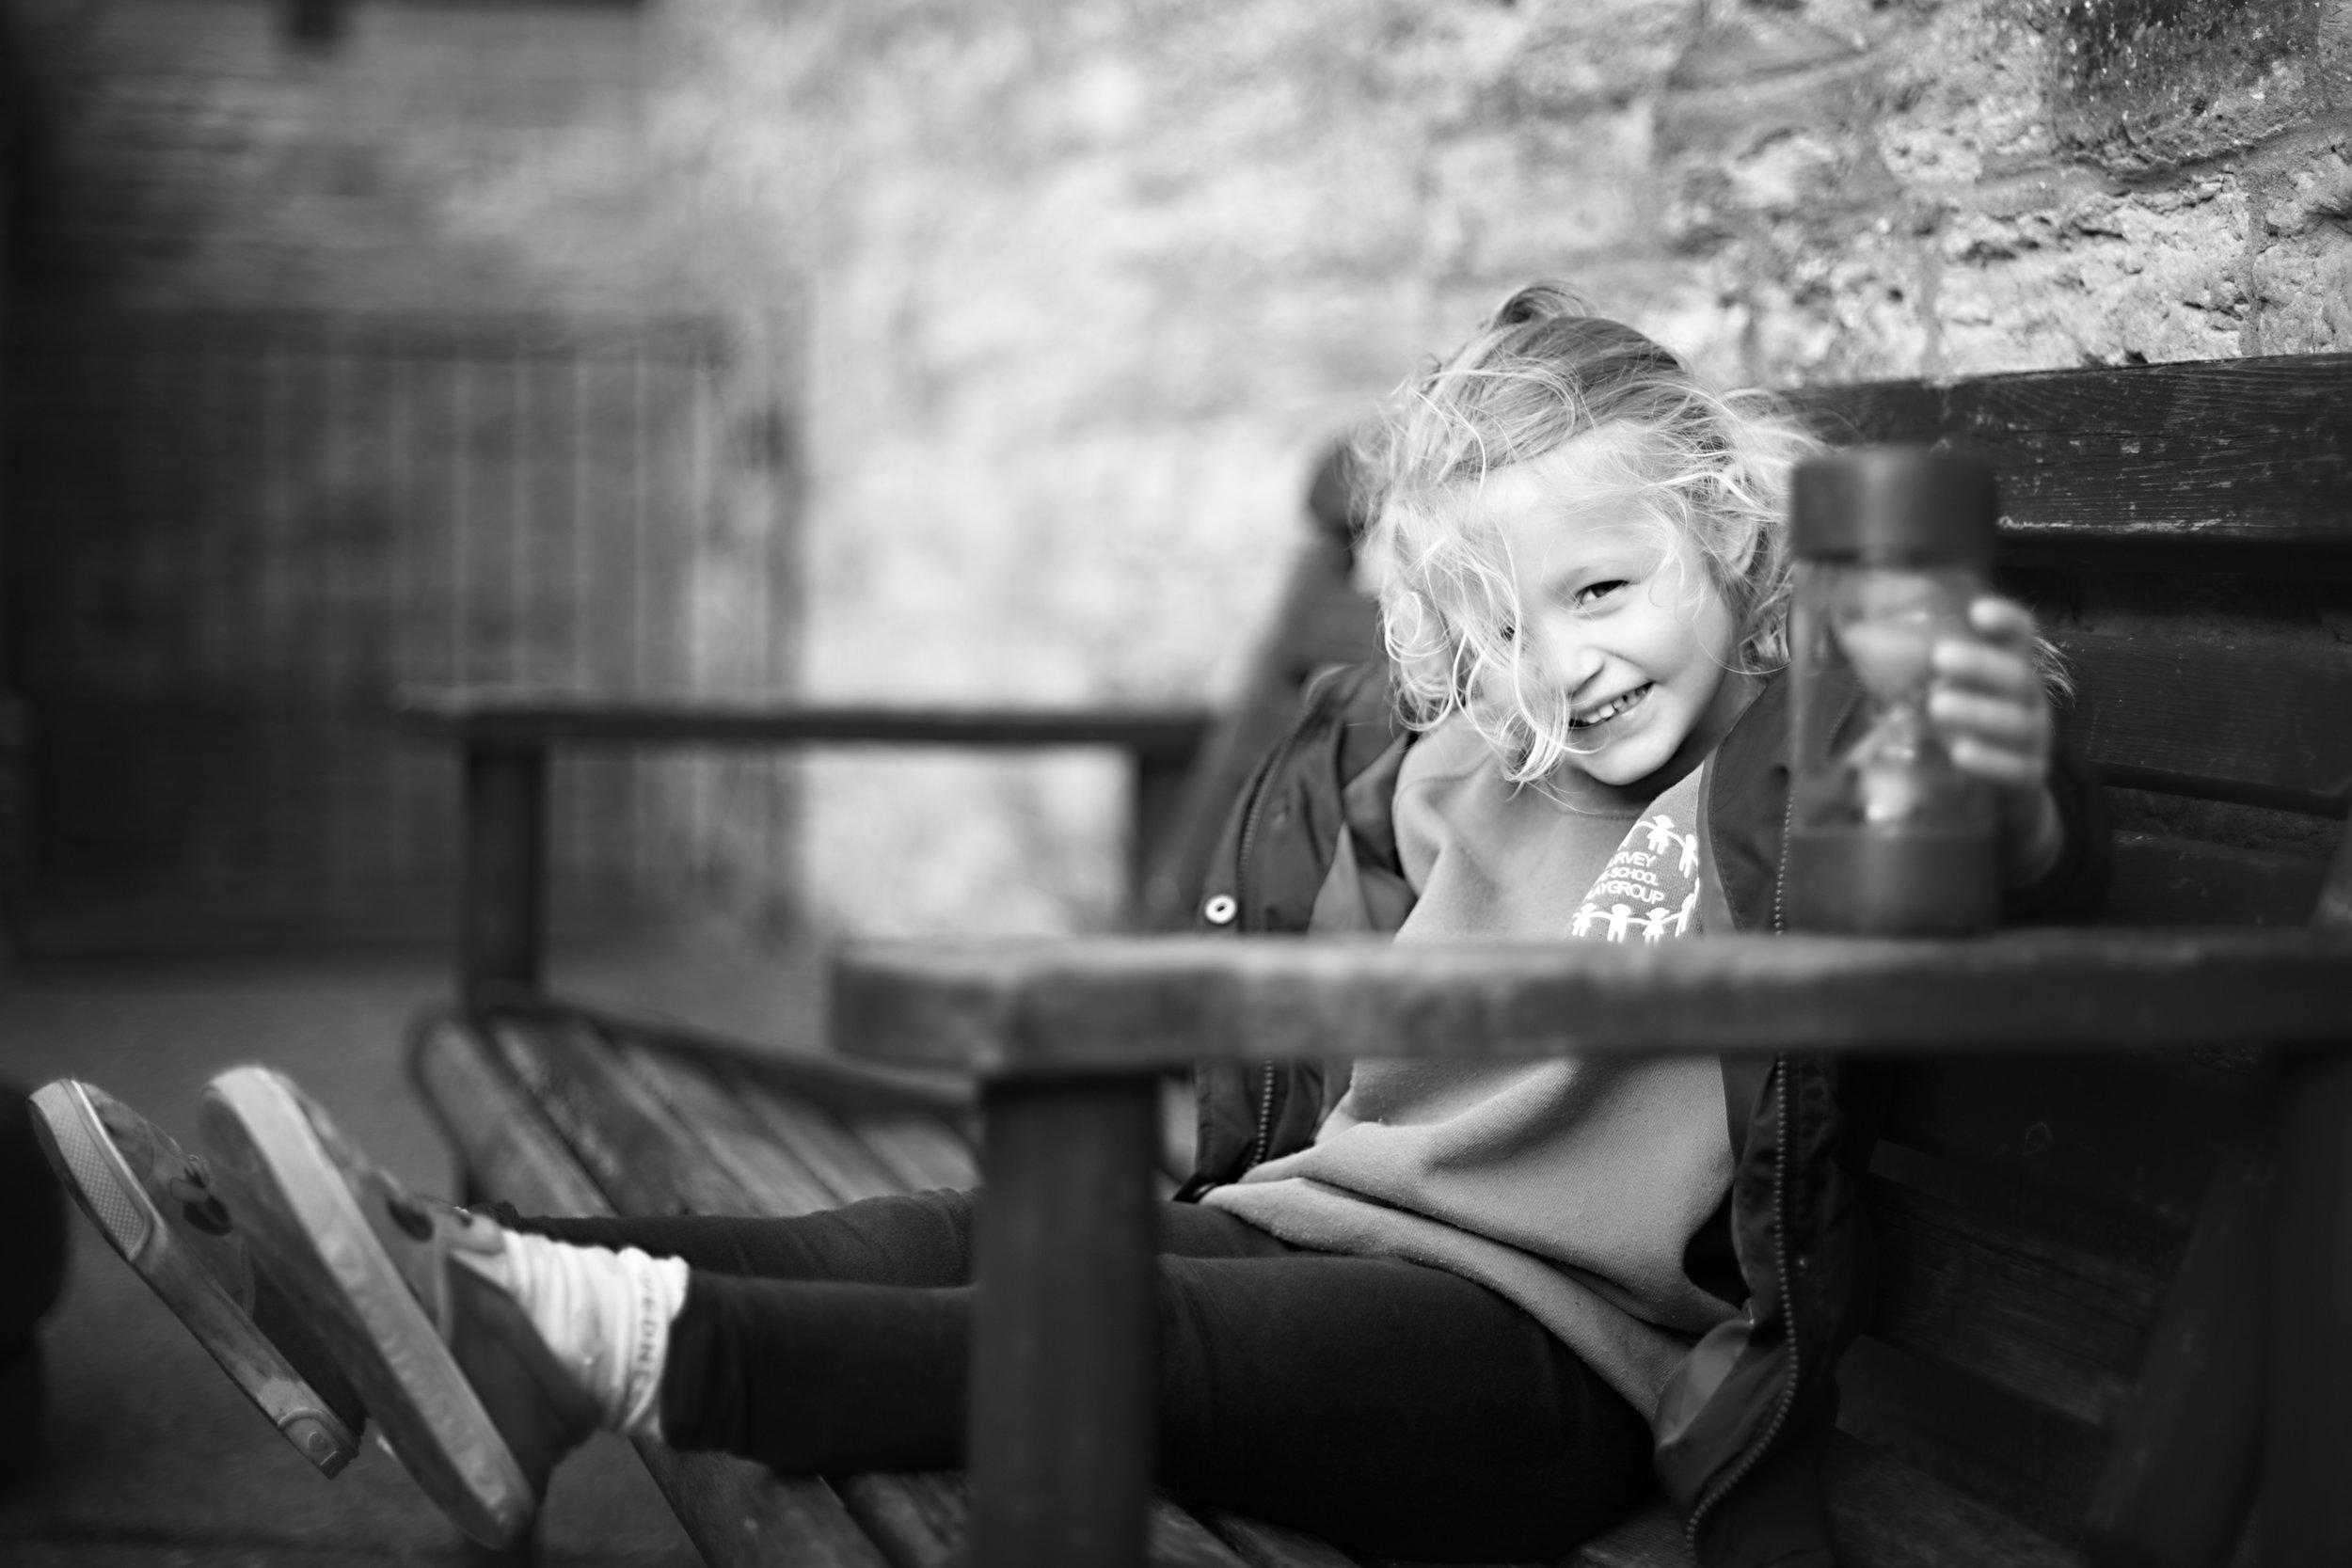 Child Portrait taken during a Preschool photoshoot in Turvey Bedford